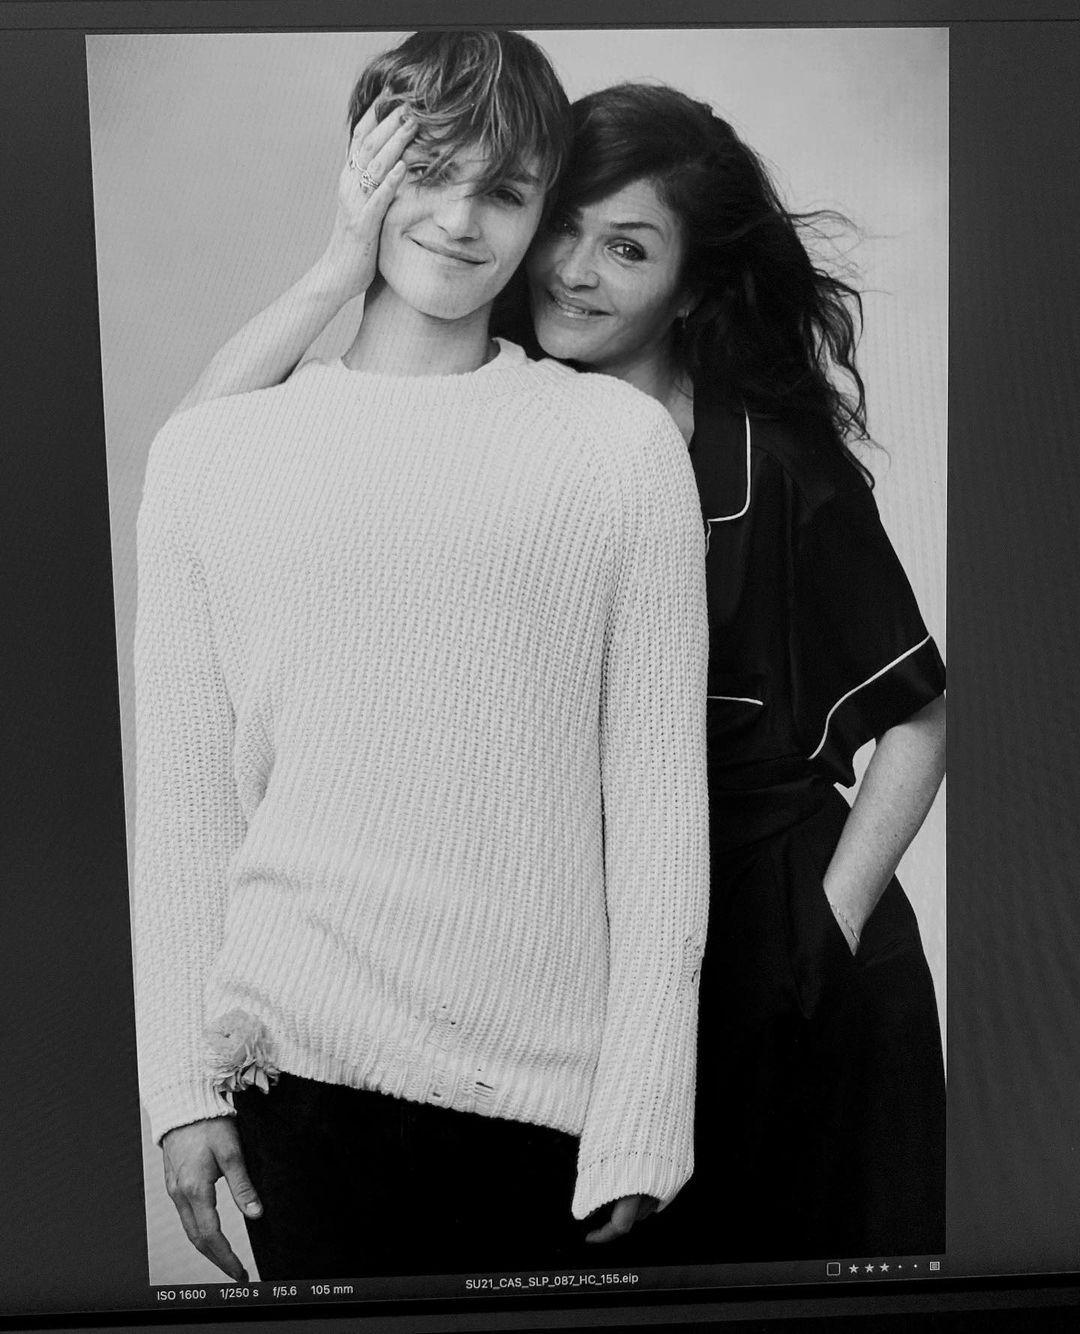 Хелена Кристенсен вместе с сыном снялись для Victoria's Secret (ФОТО) - фото №2